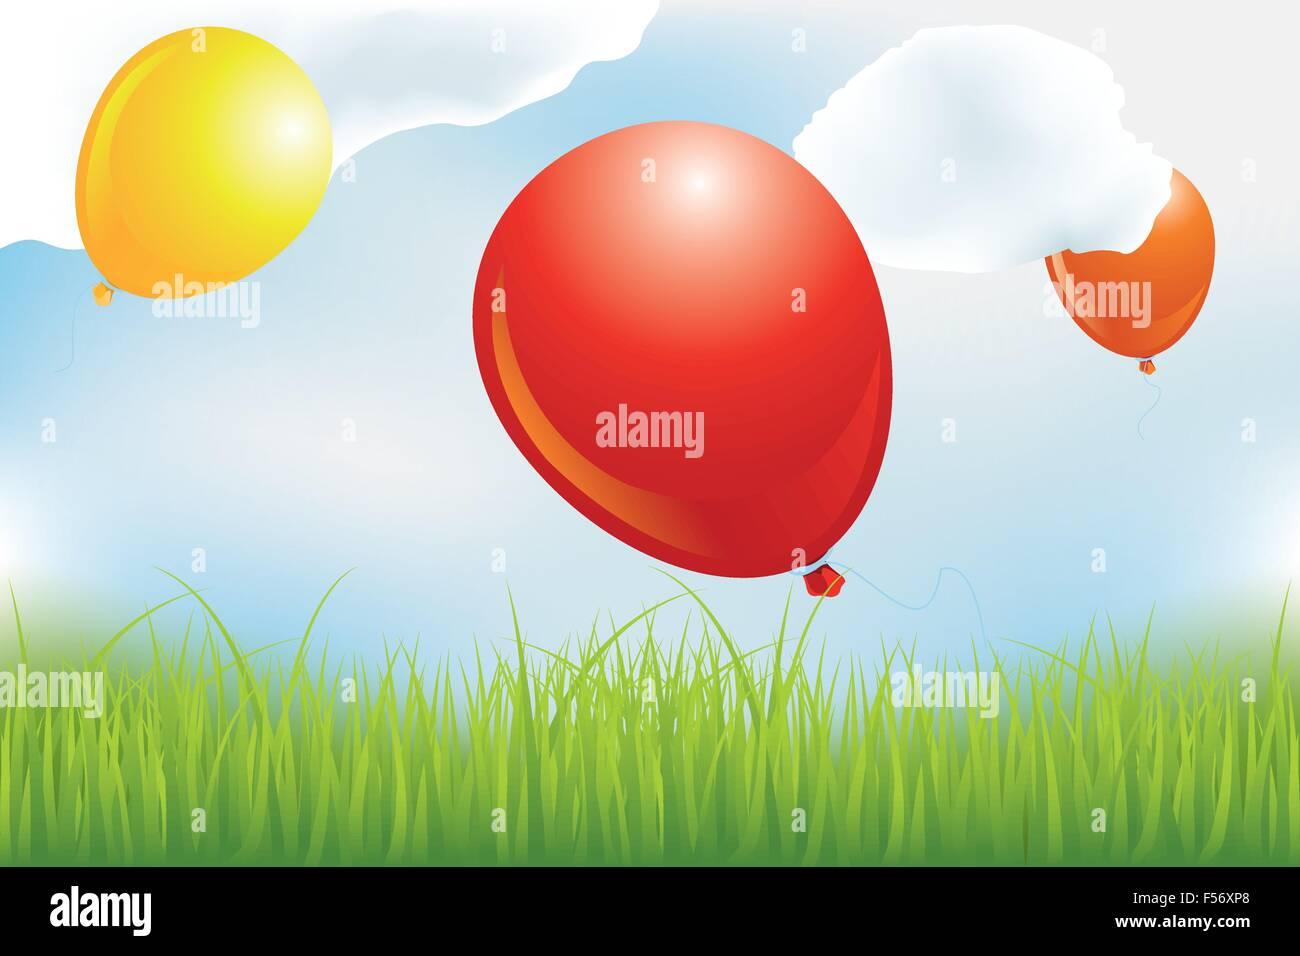 Balloons over meadow in clouds - eps 10 vectors - Stock Vector